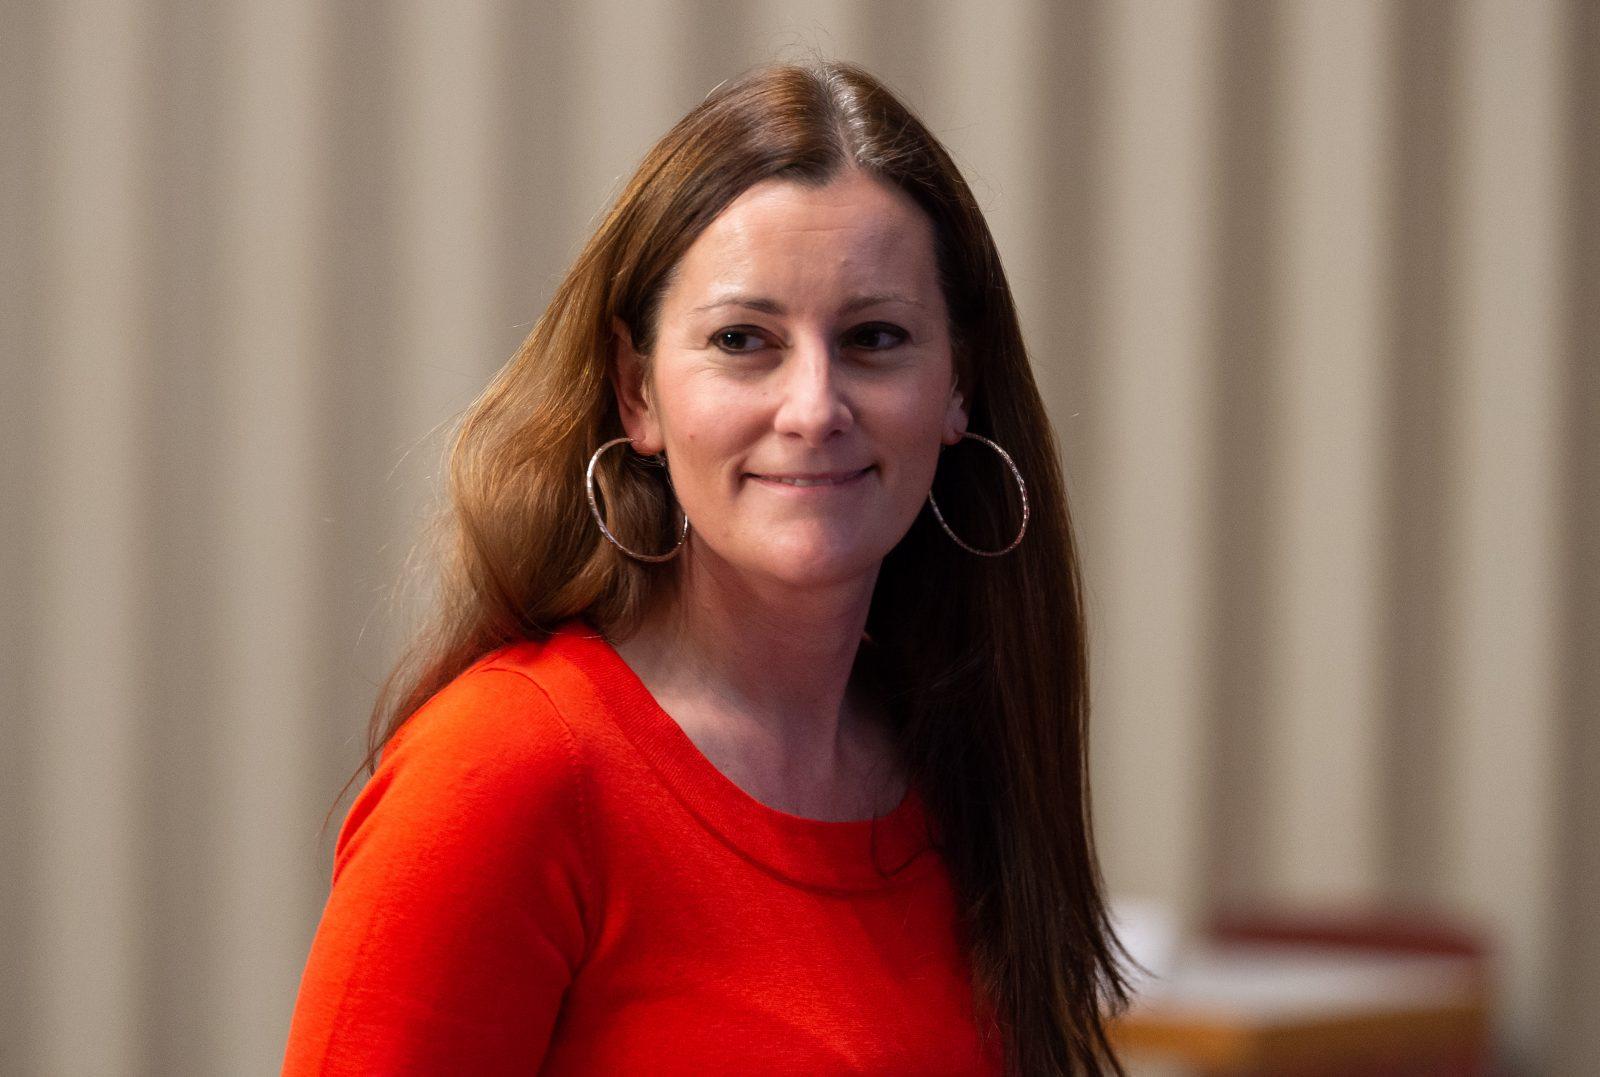 Janine Wissler (Linkspartei)